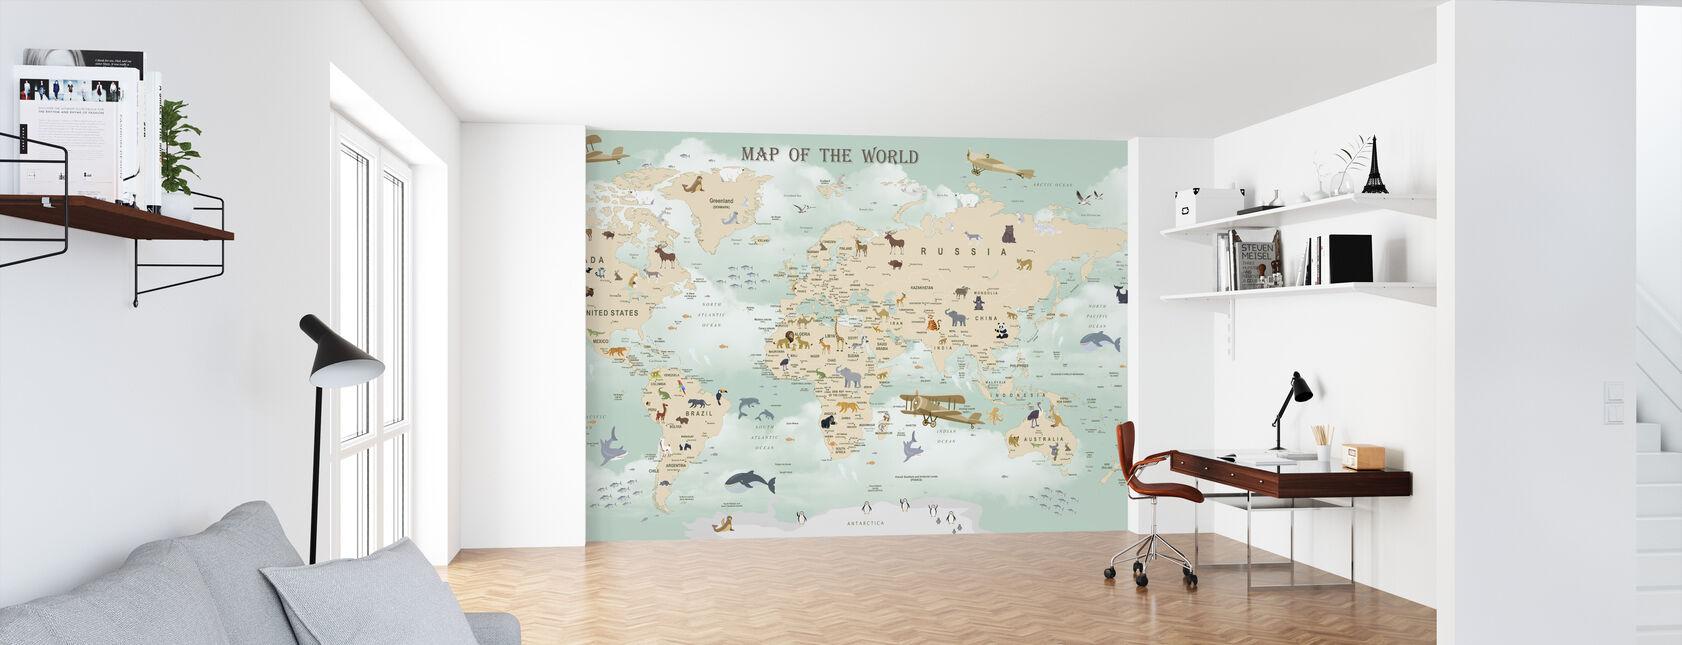 Wildlife World Map - Wallpaper - Office